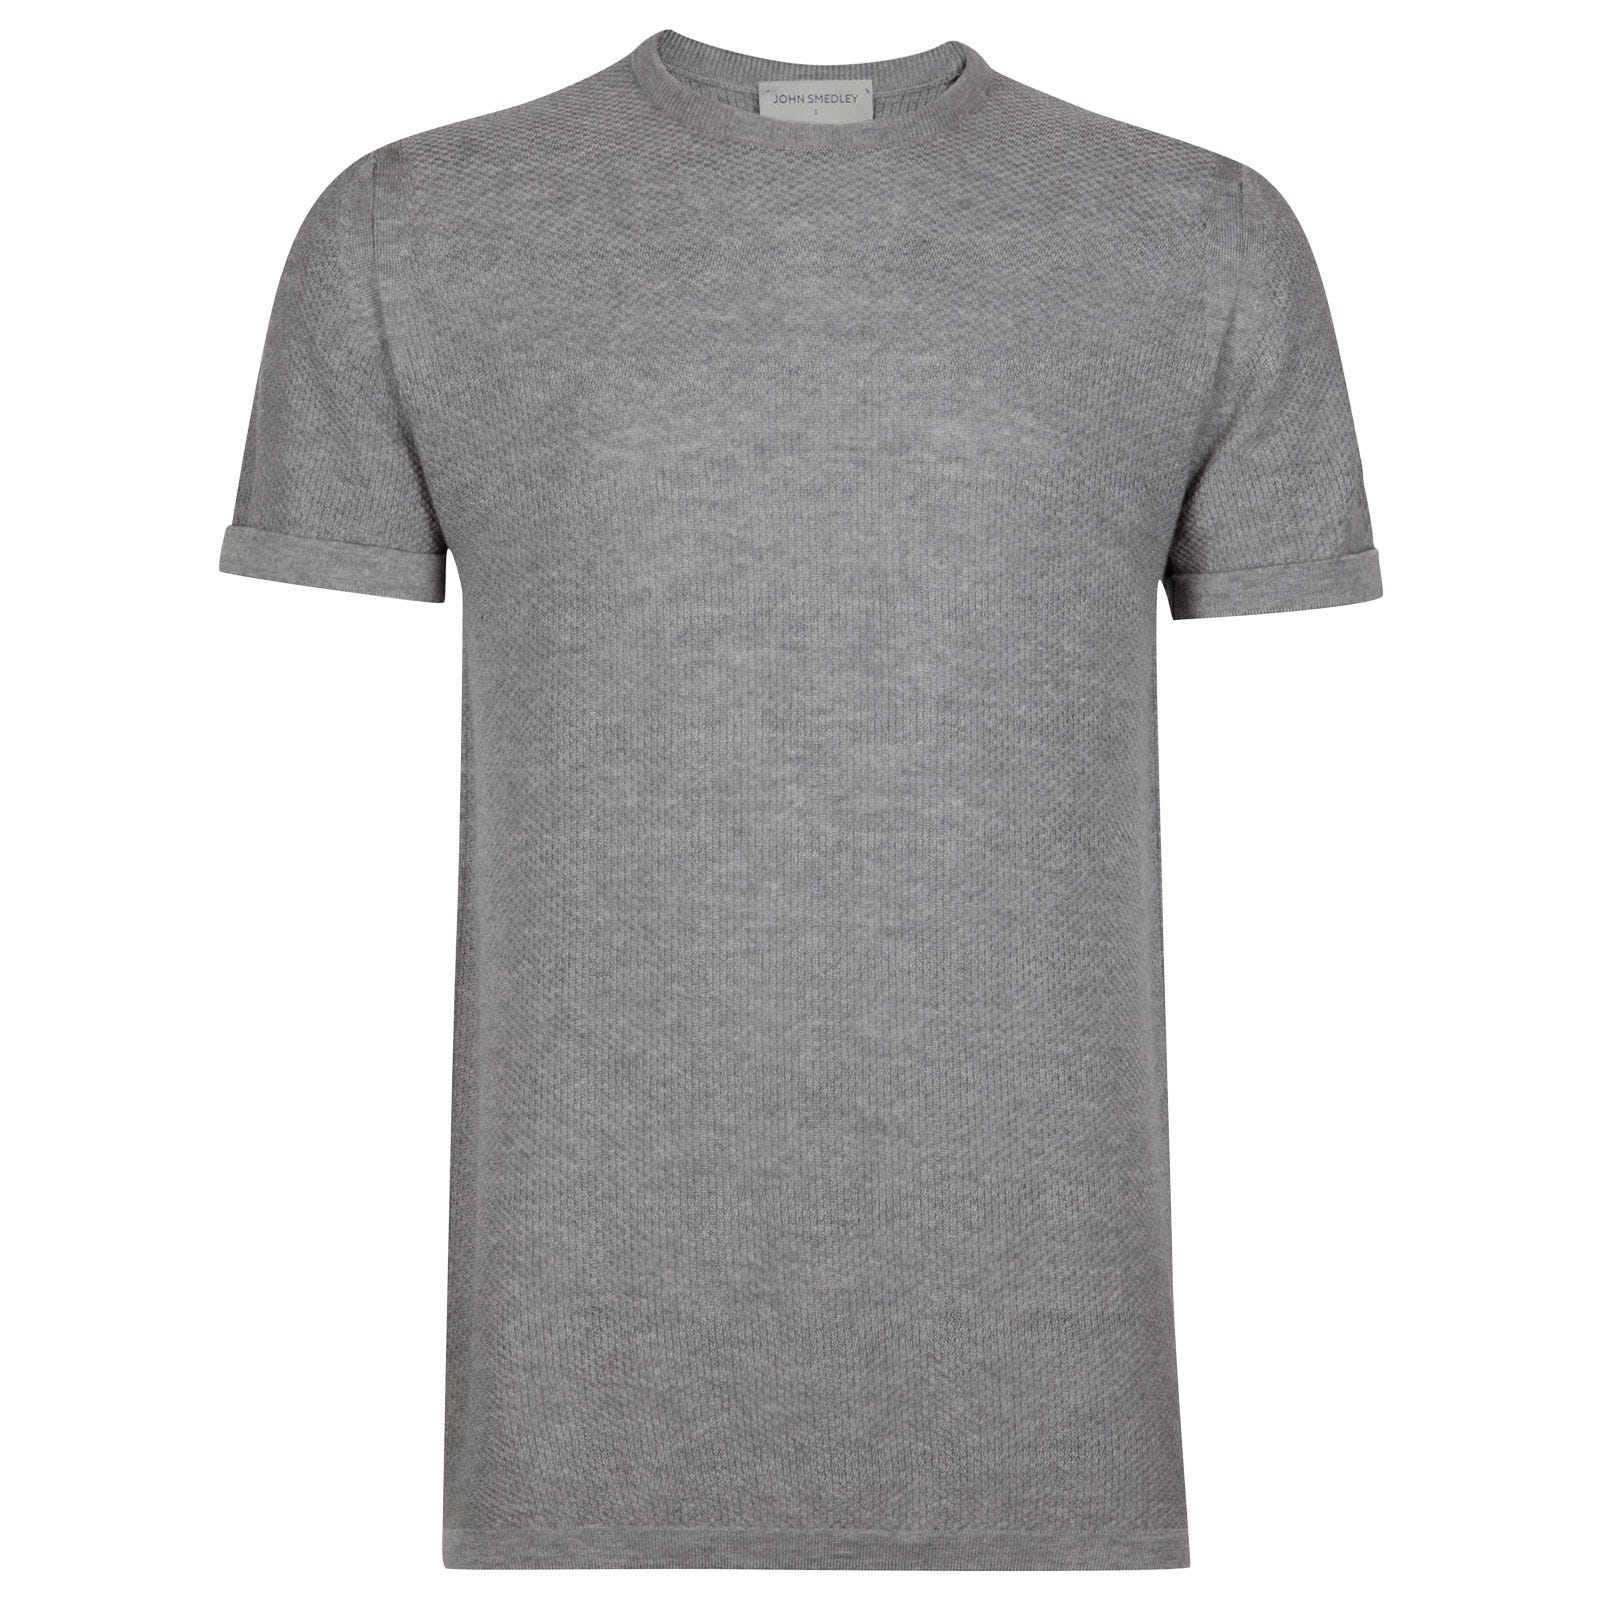 2Singular in Silver T-Shirt-XXL